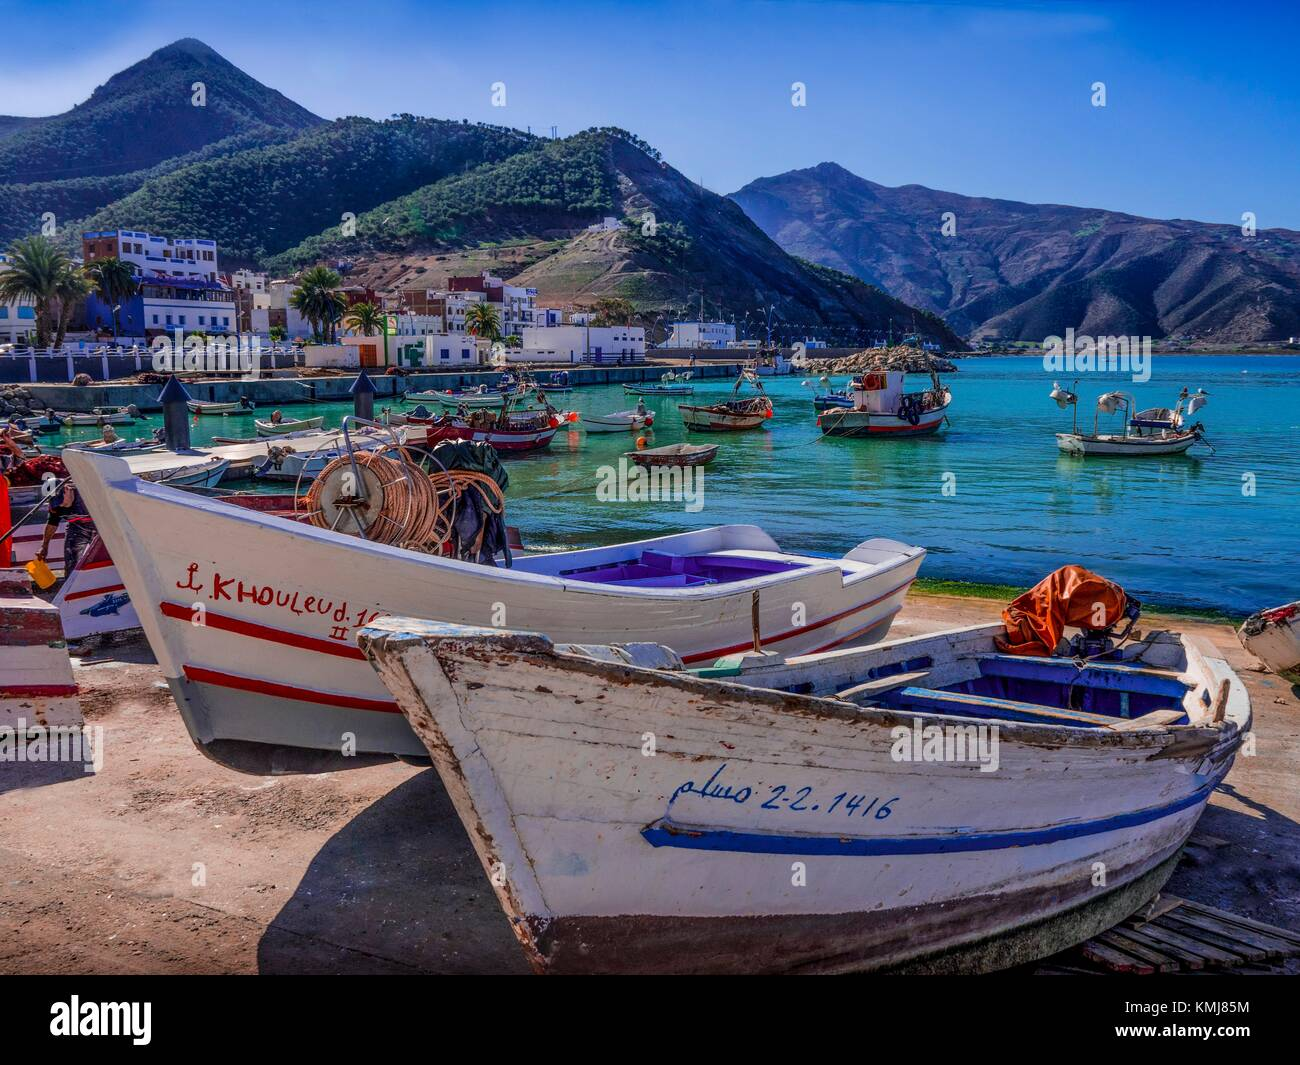 Marruecos, Seba, en la costa mediterránea. Imagen De Stock